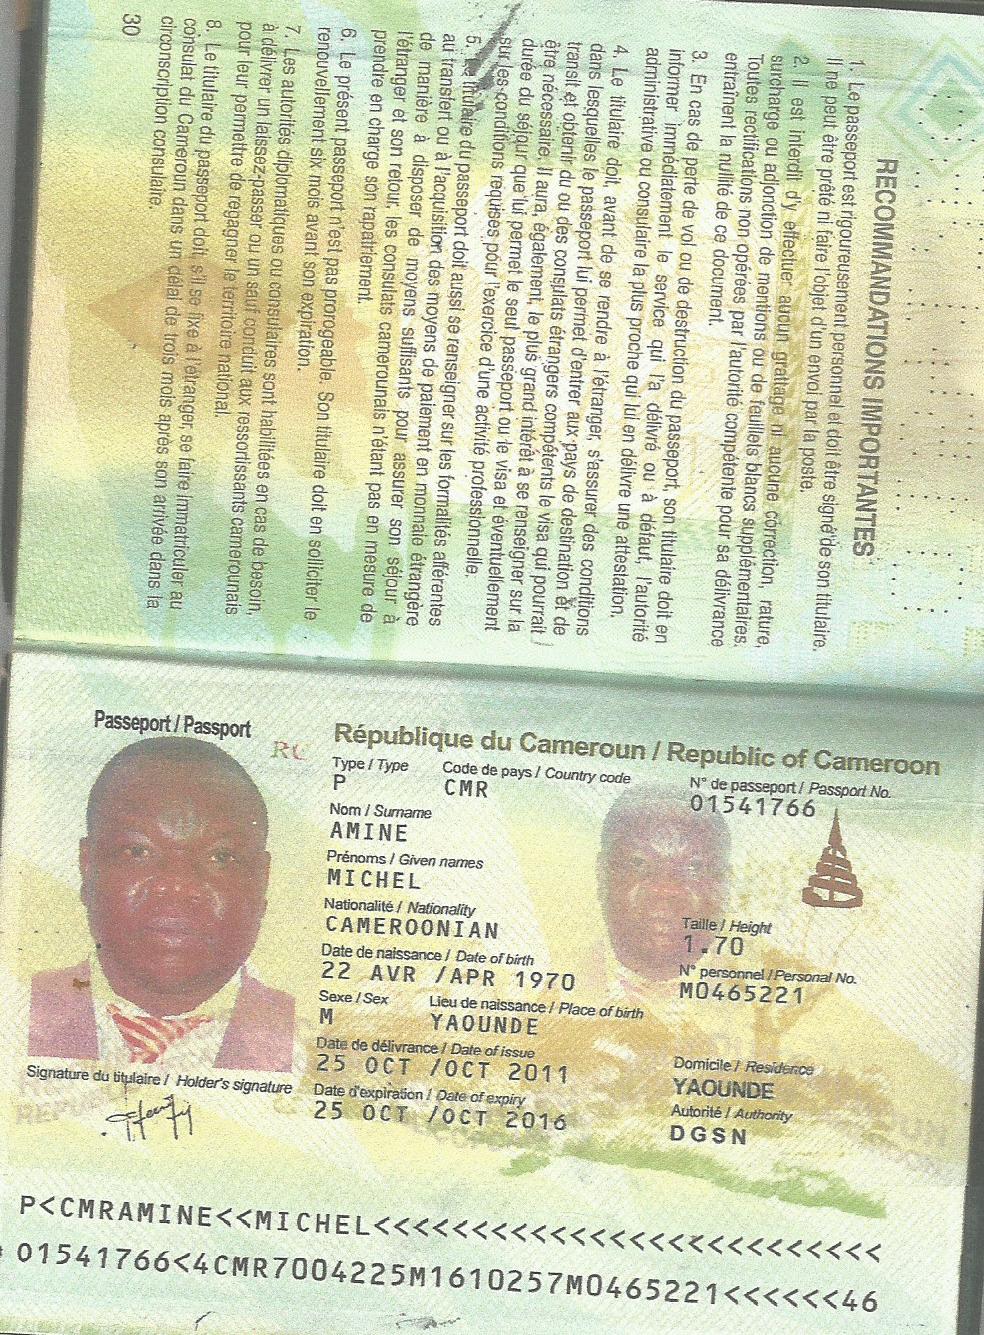 passeport_camerounais_Michel_Amine